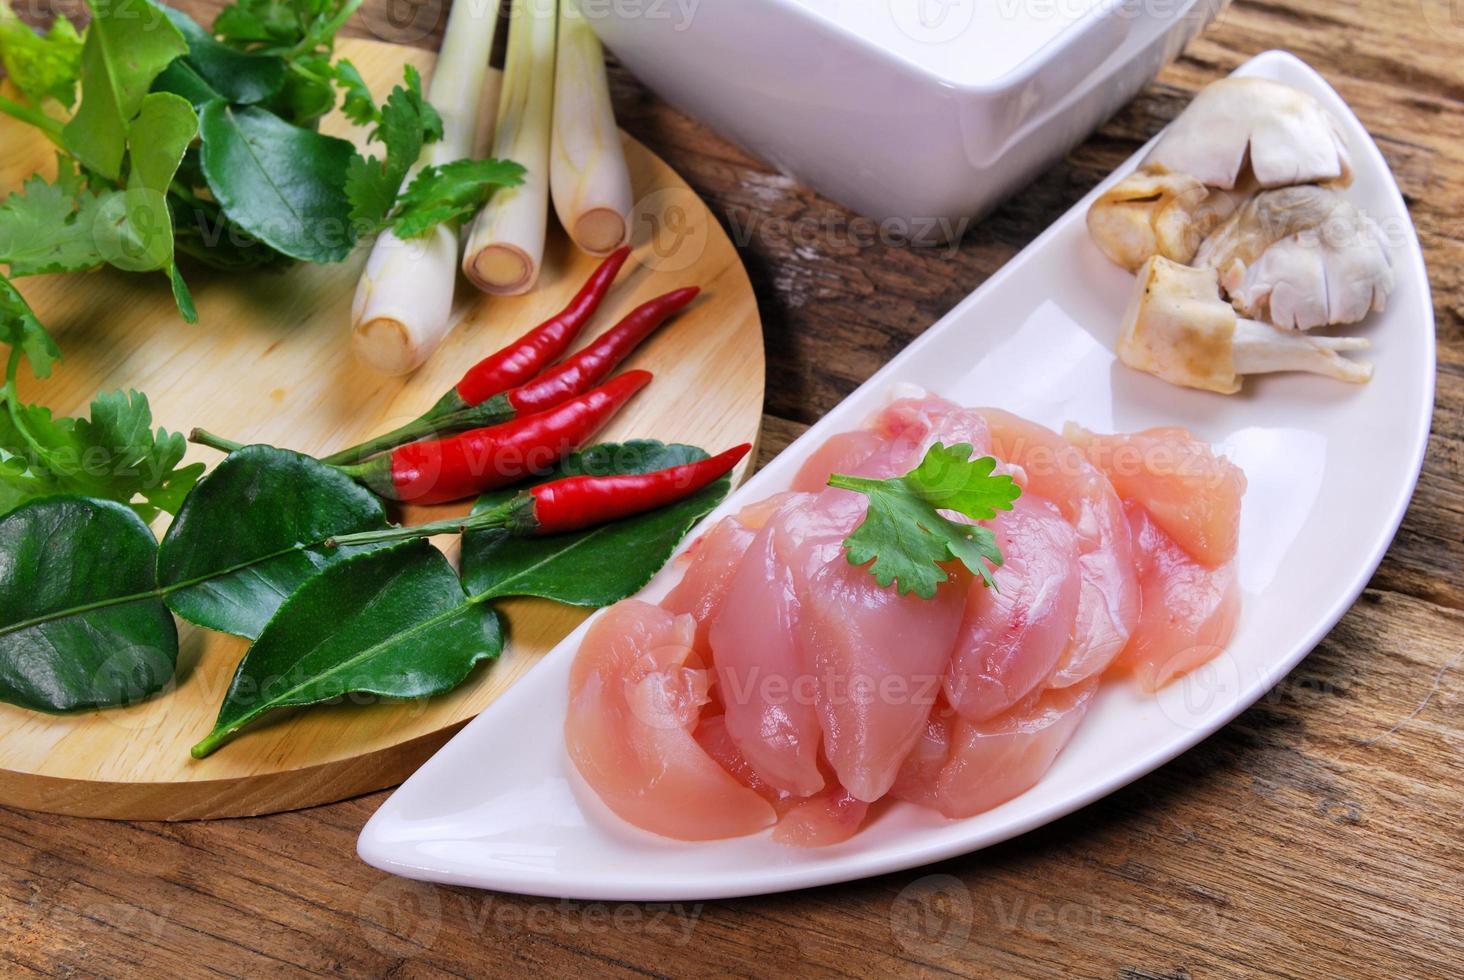 thai cuisine  tom kha kai  chicken in coconut milk soup photo